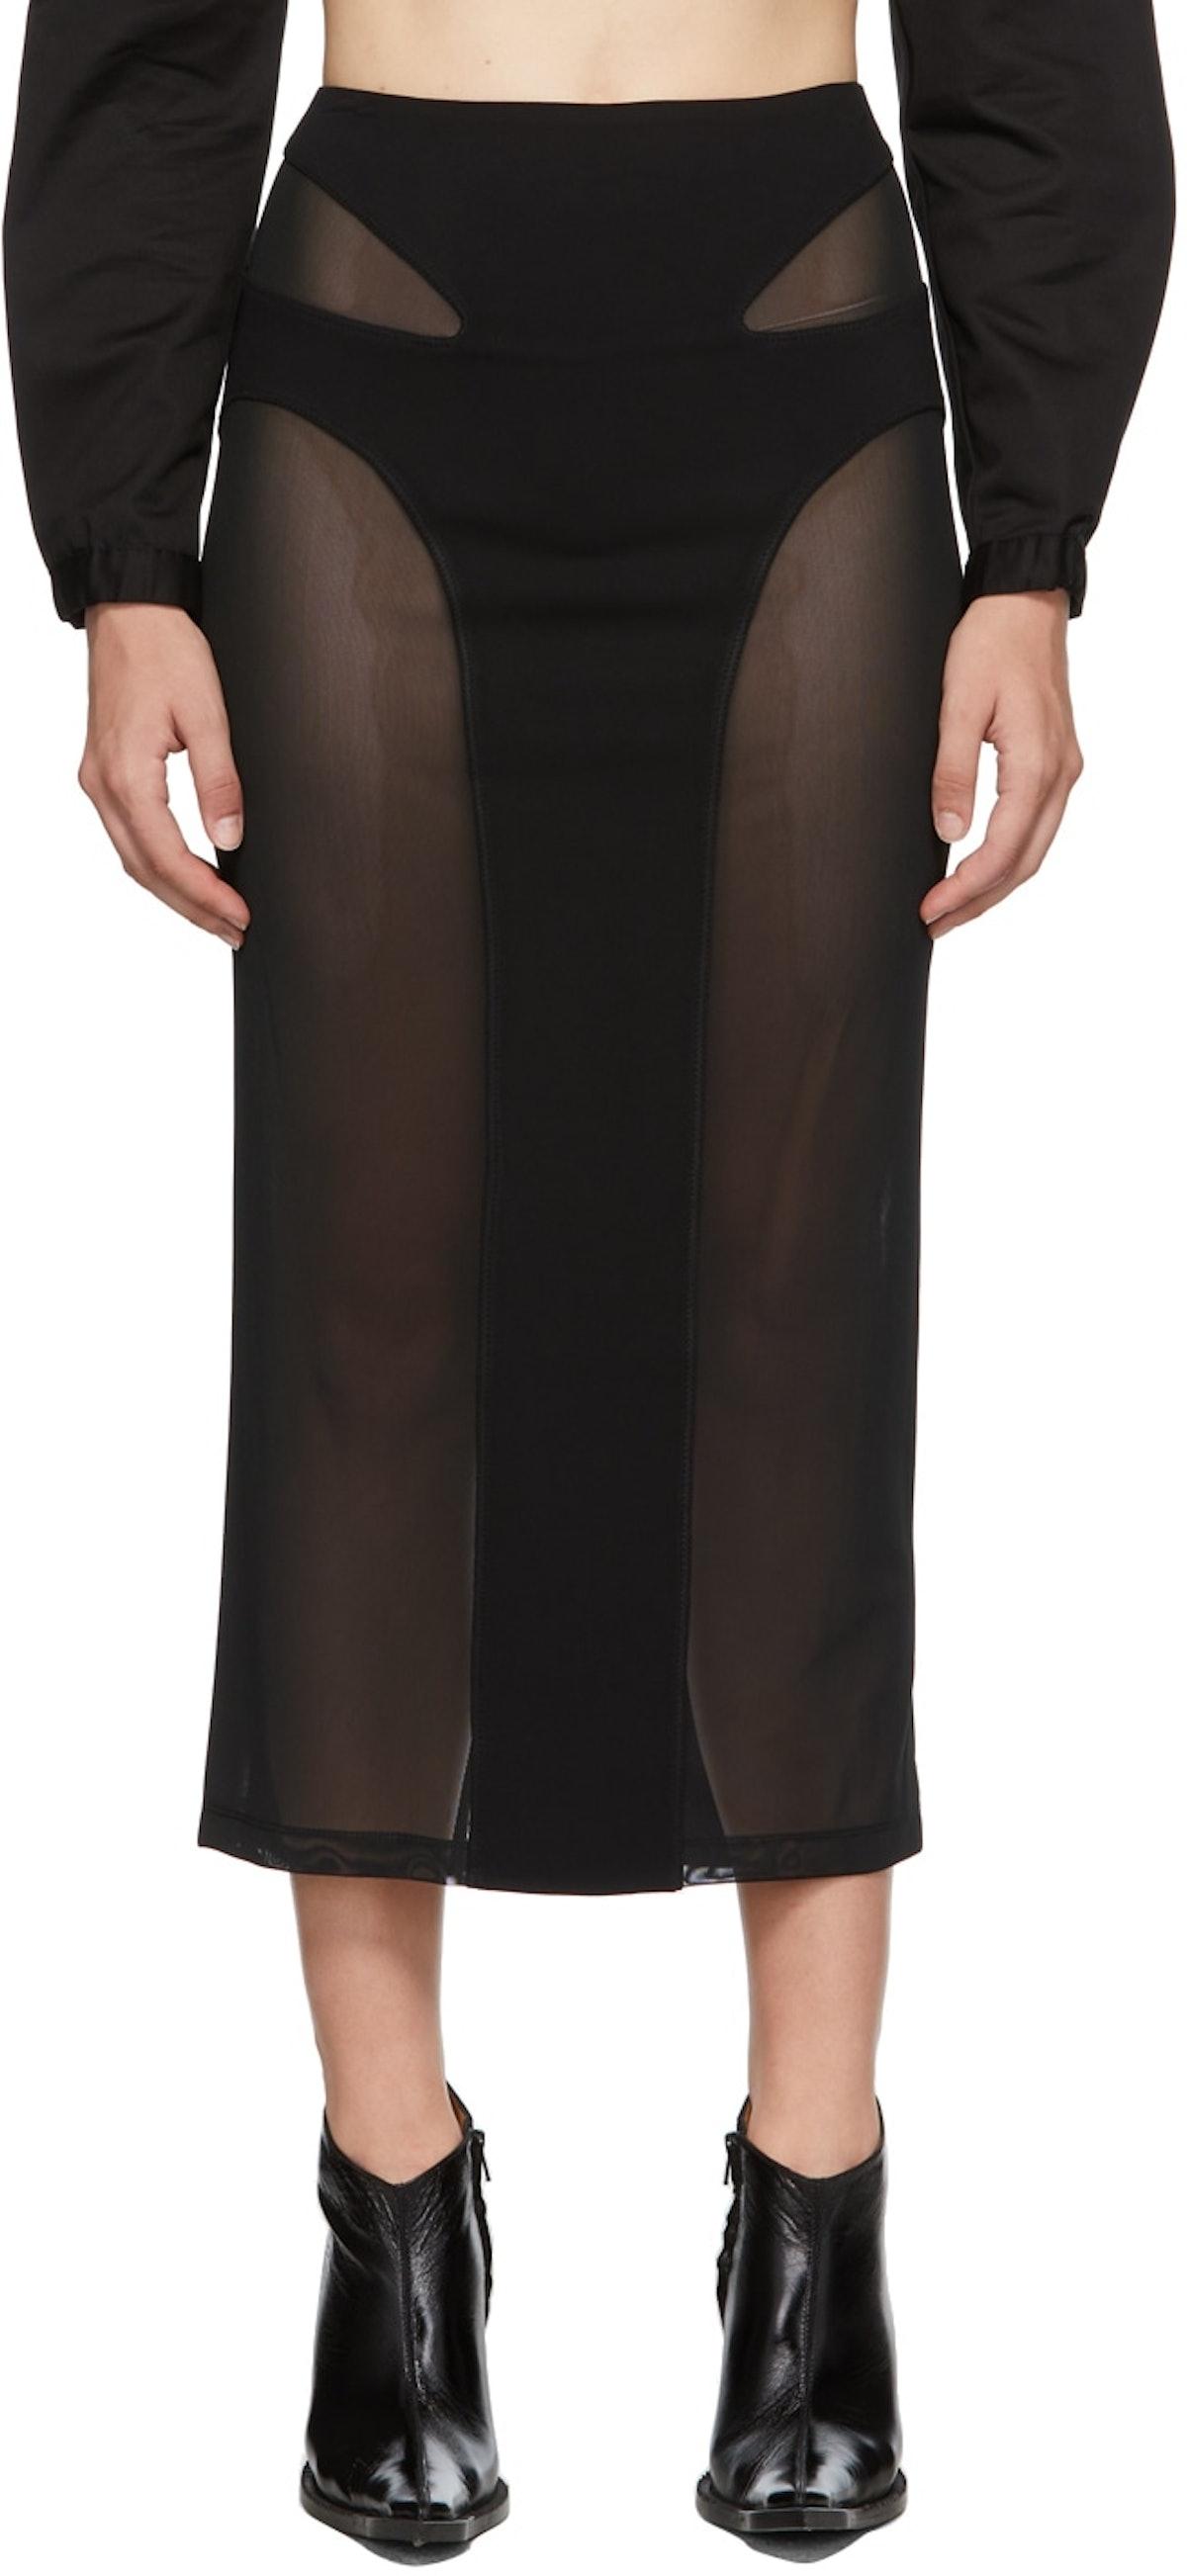 Dion Lee Black Mesh Contour Skirt